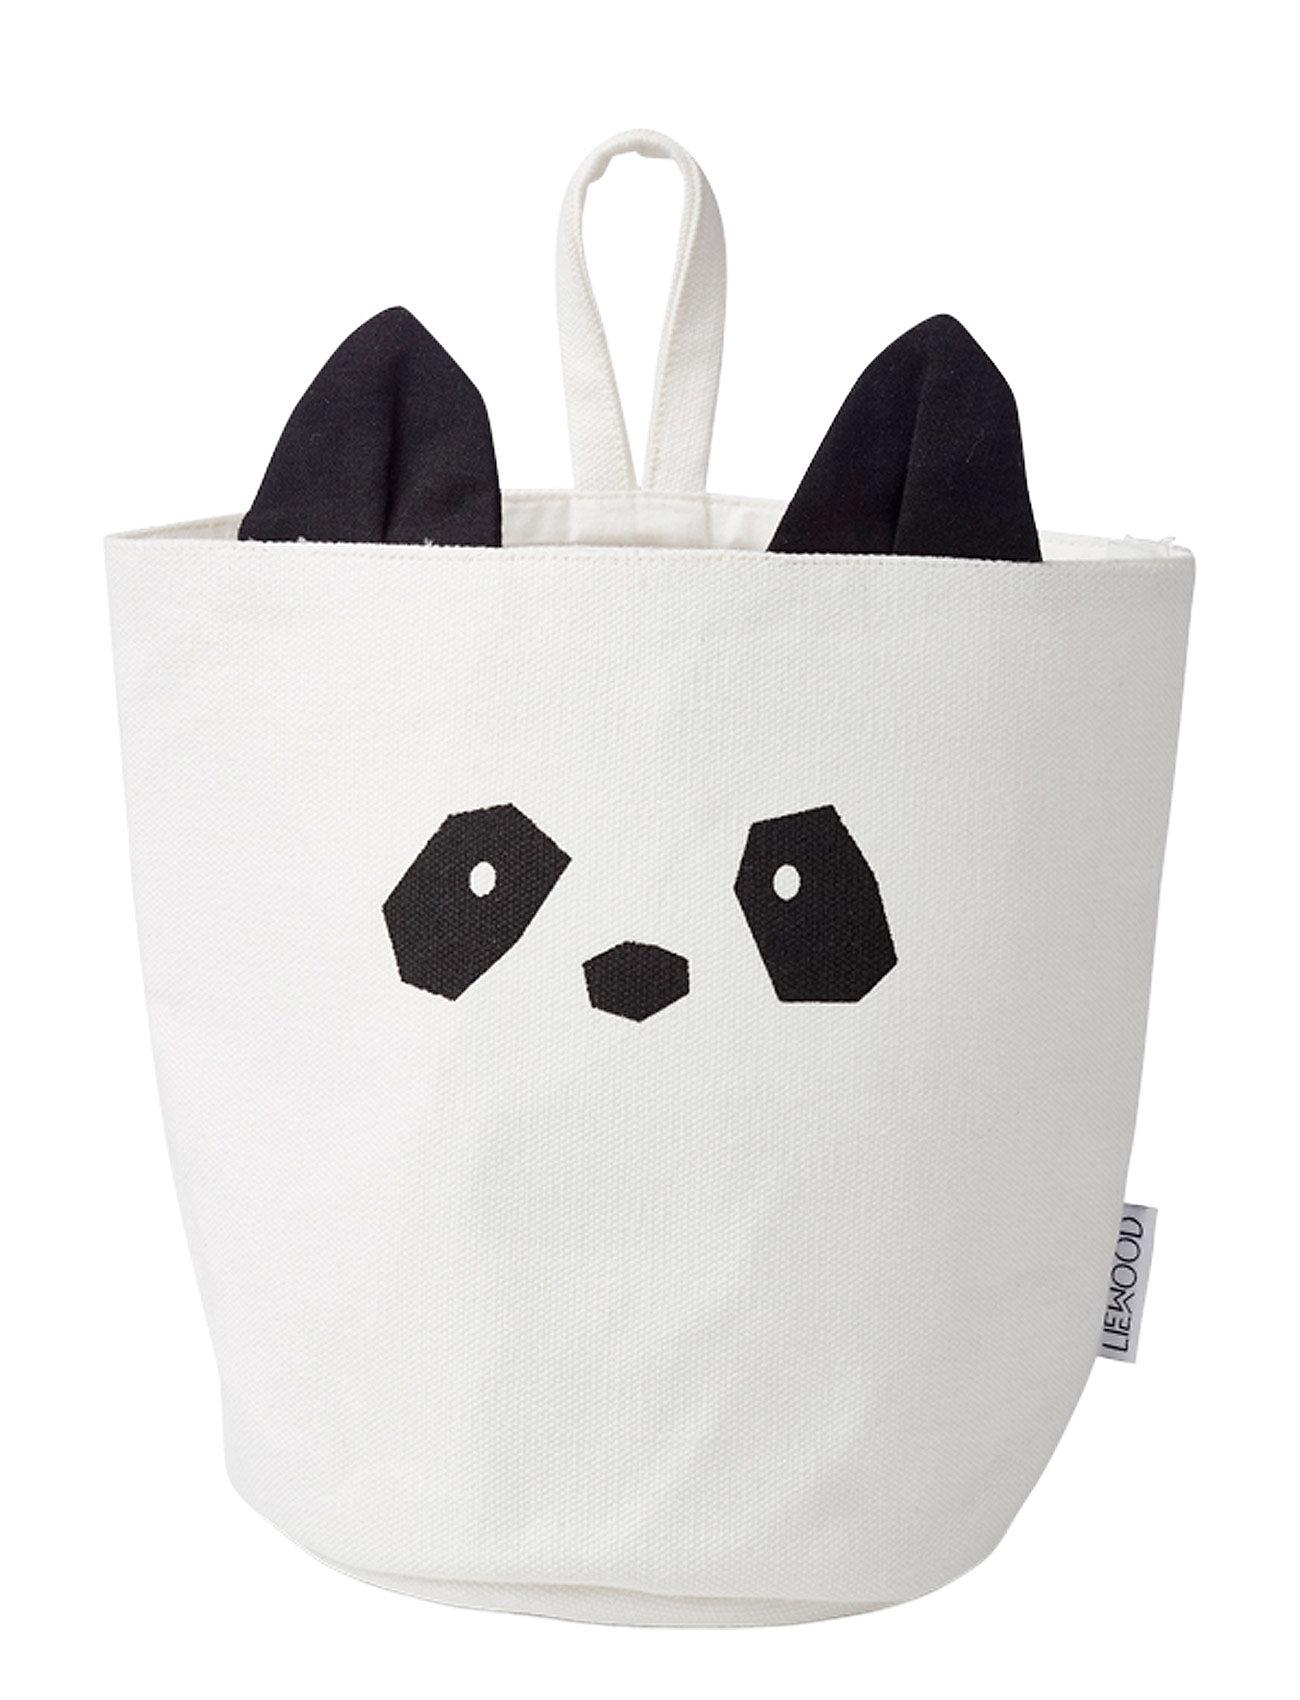 Liewood Ib fabric basket - PANDA CREME DE LA CREME